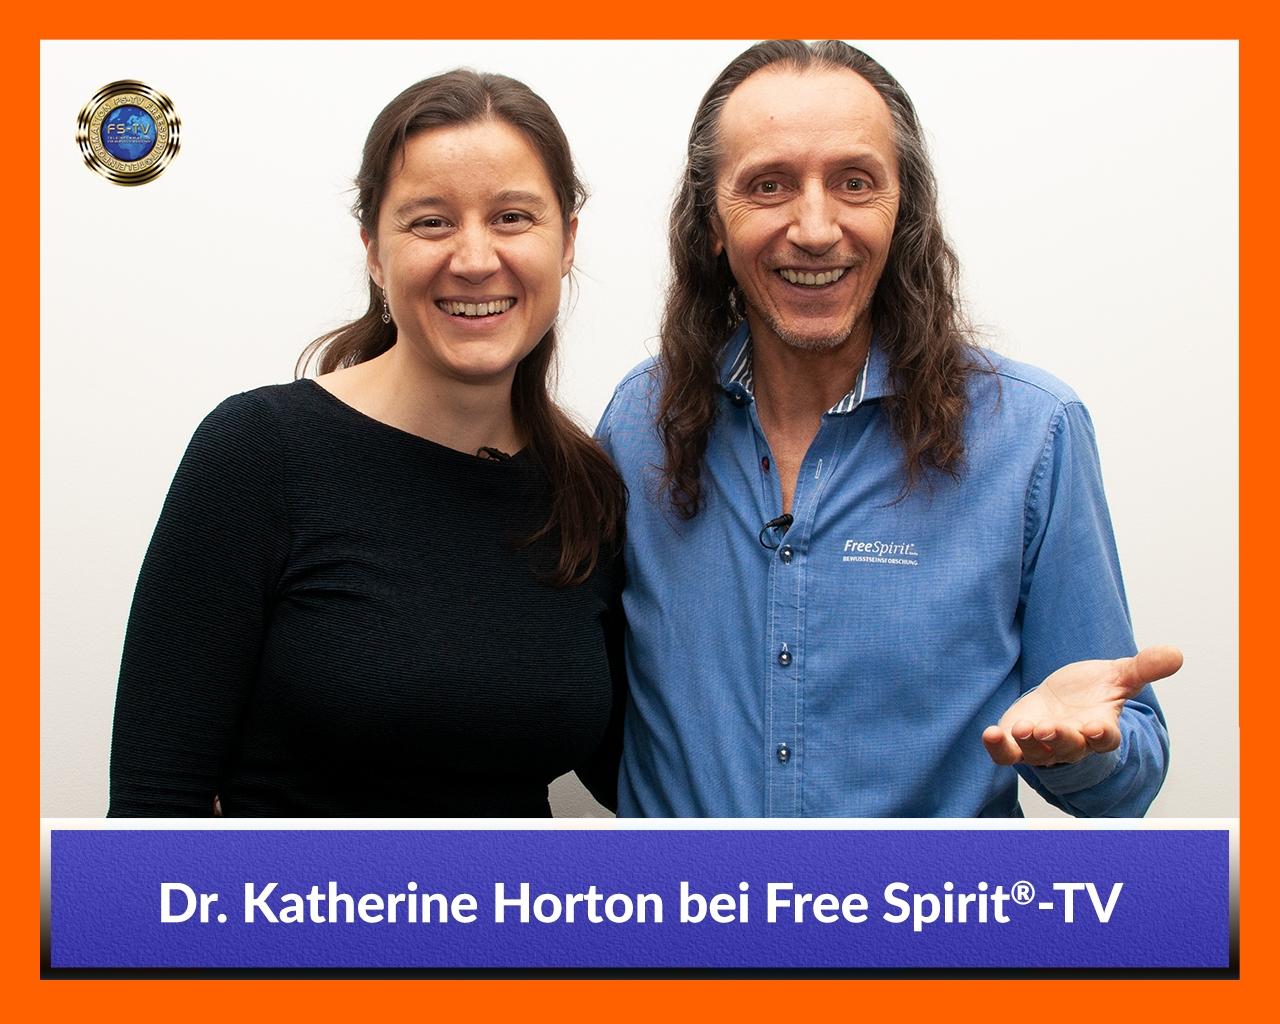 Galleriebild-Dr.Katherine-Horton-10